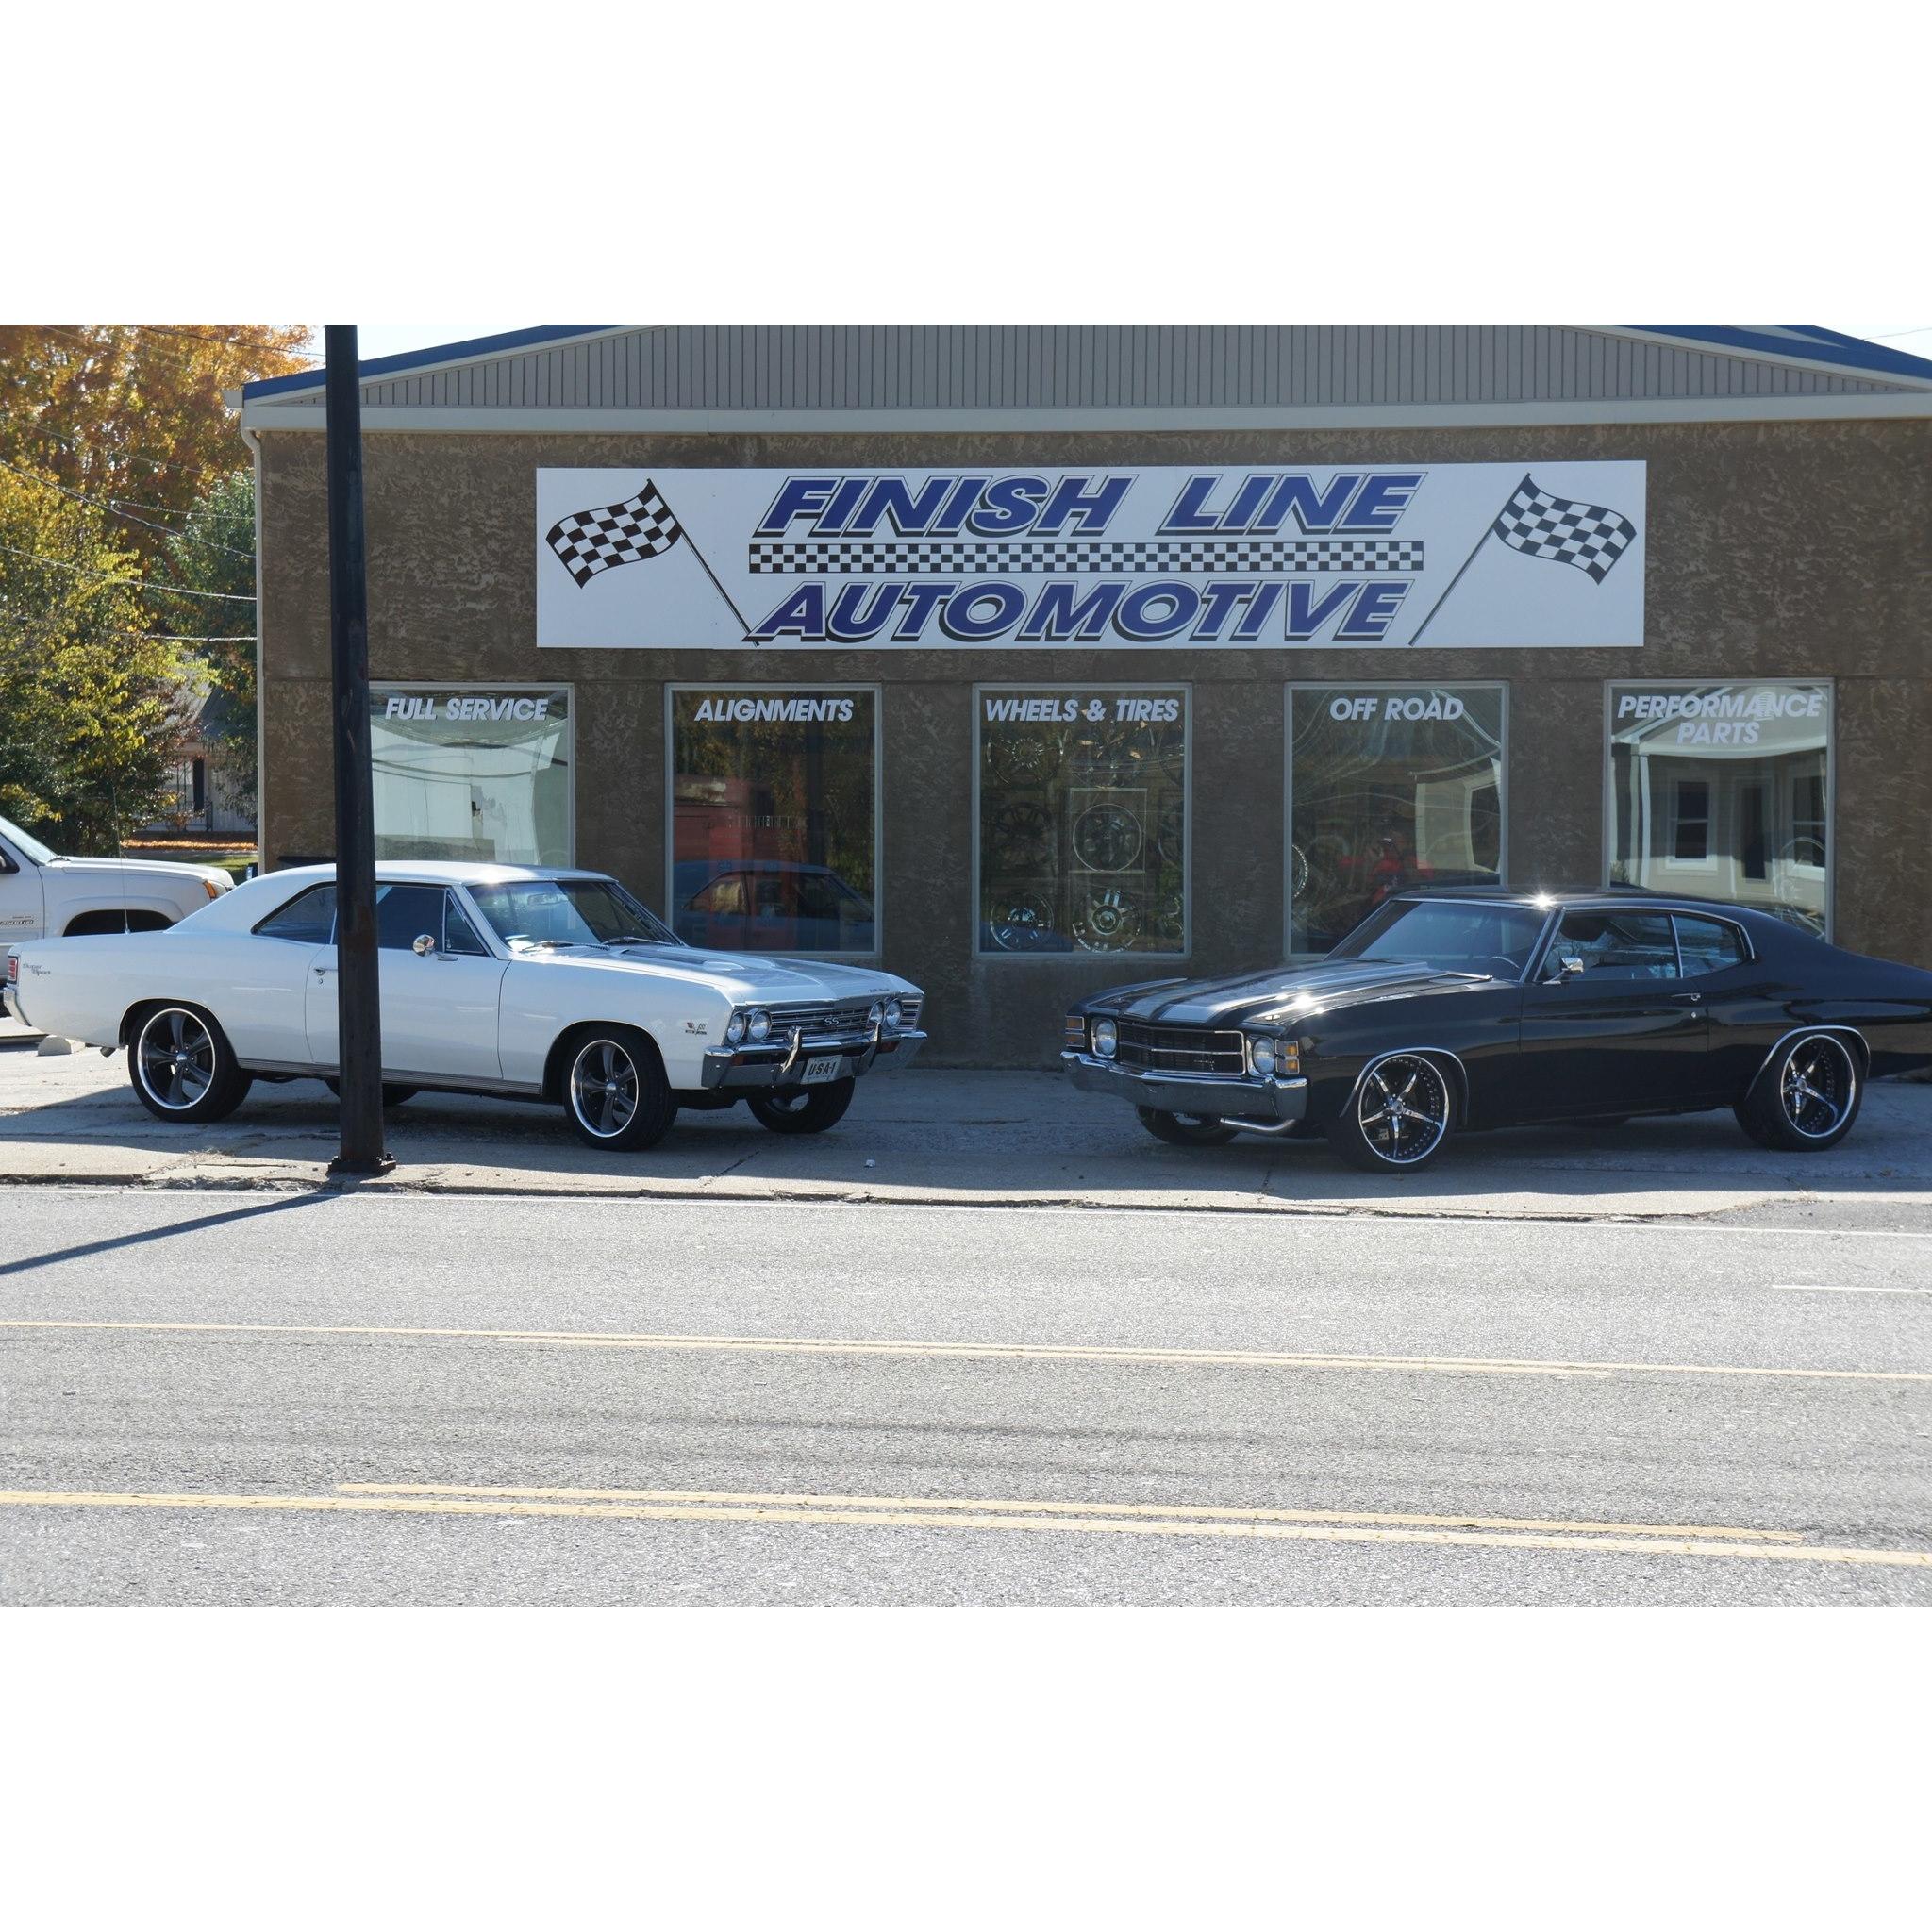 Finish Line Automotive